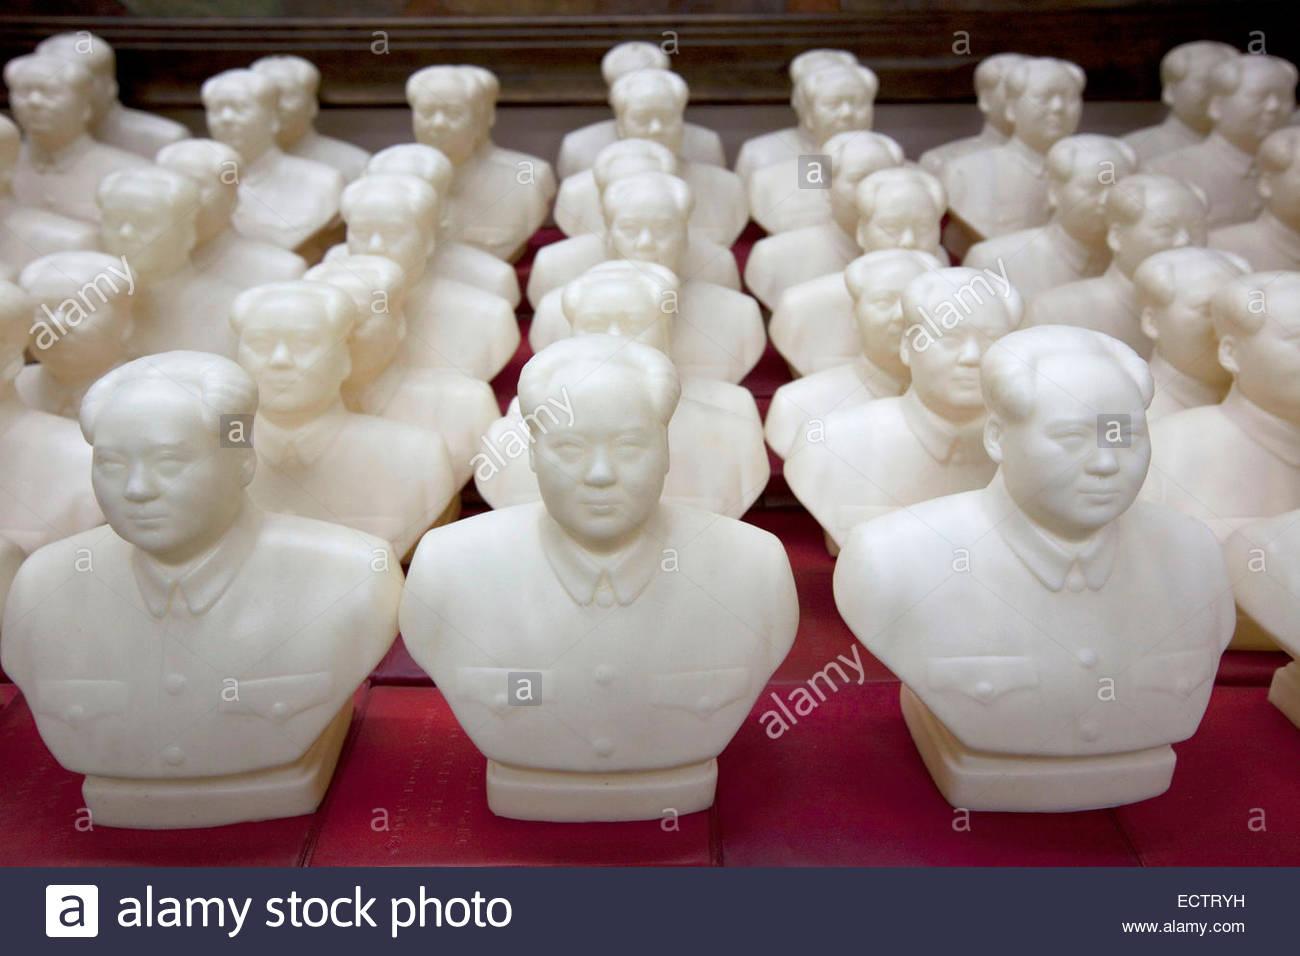 Shanghai, Mao statues in Propaganda Museum. - Stock Image